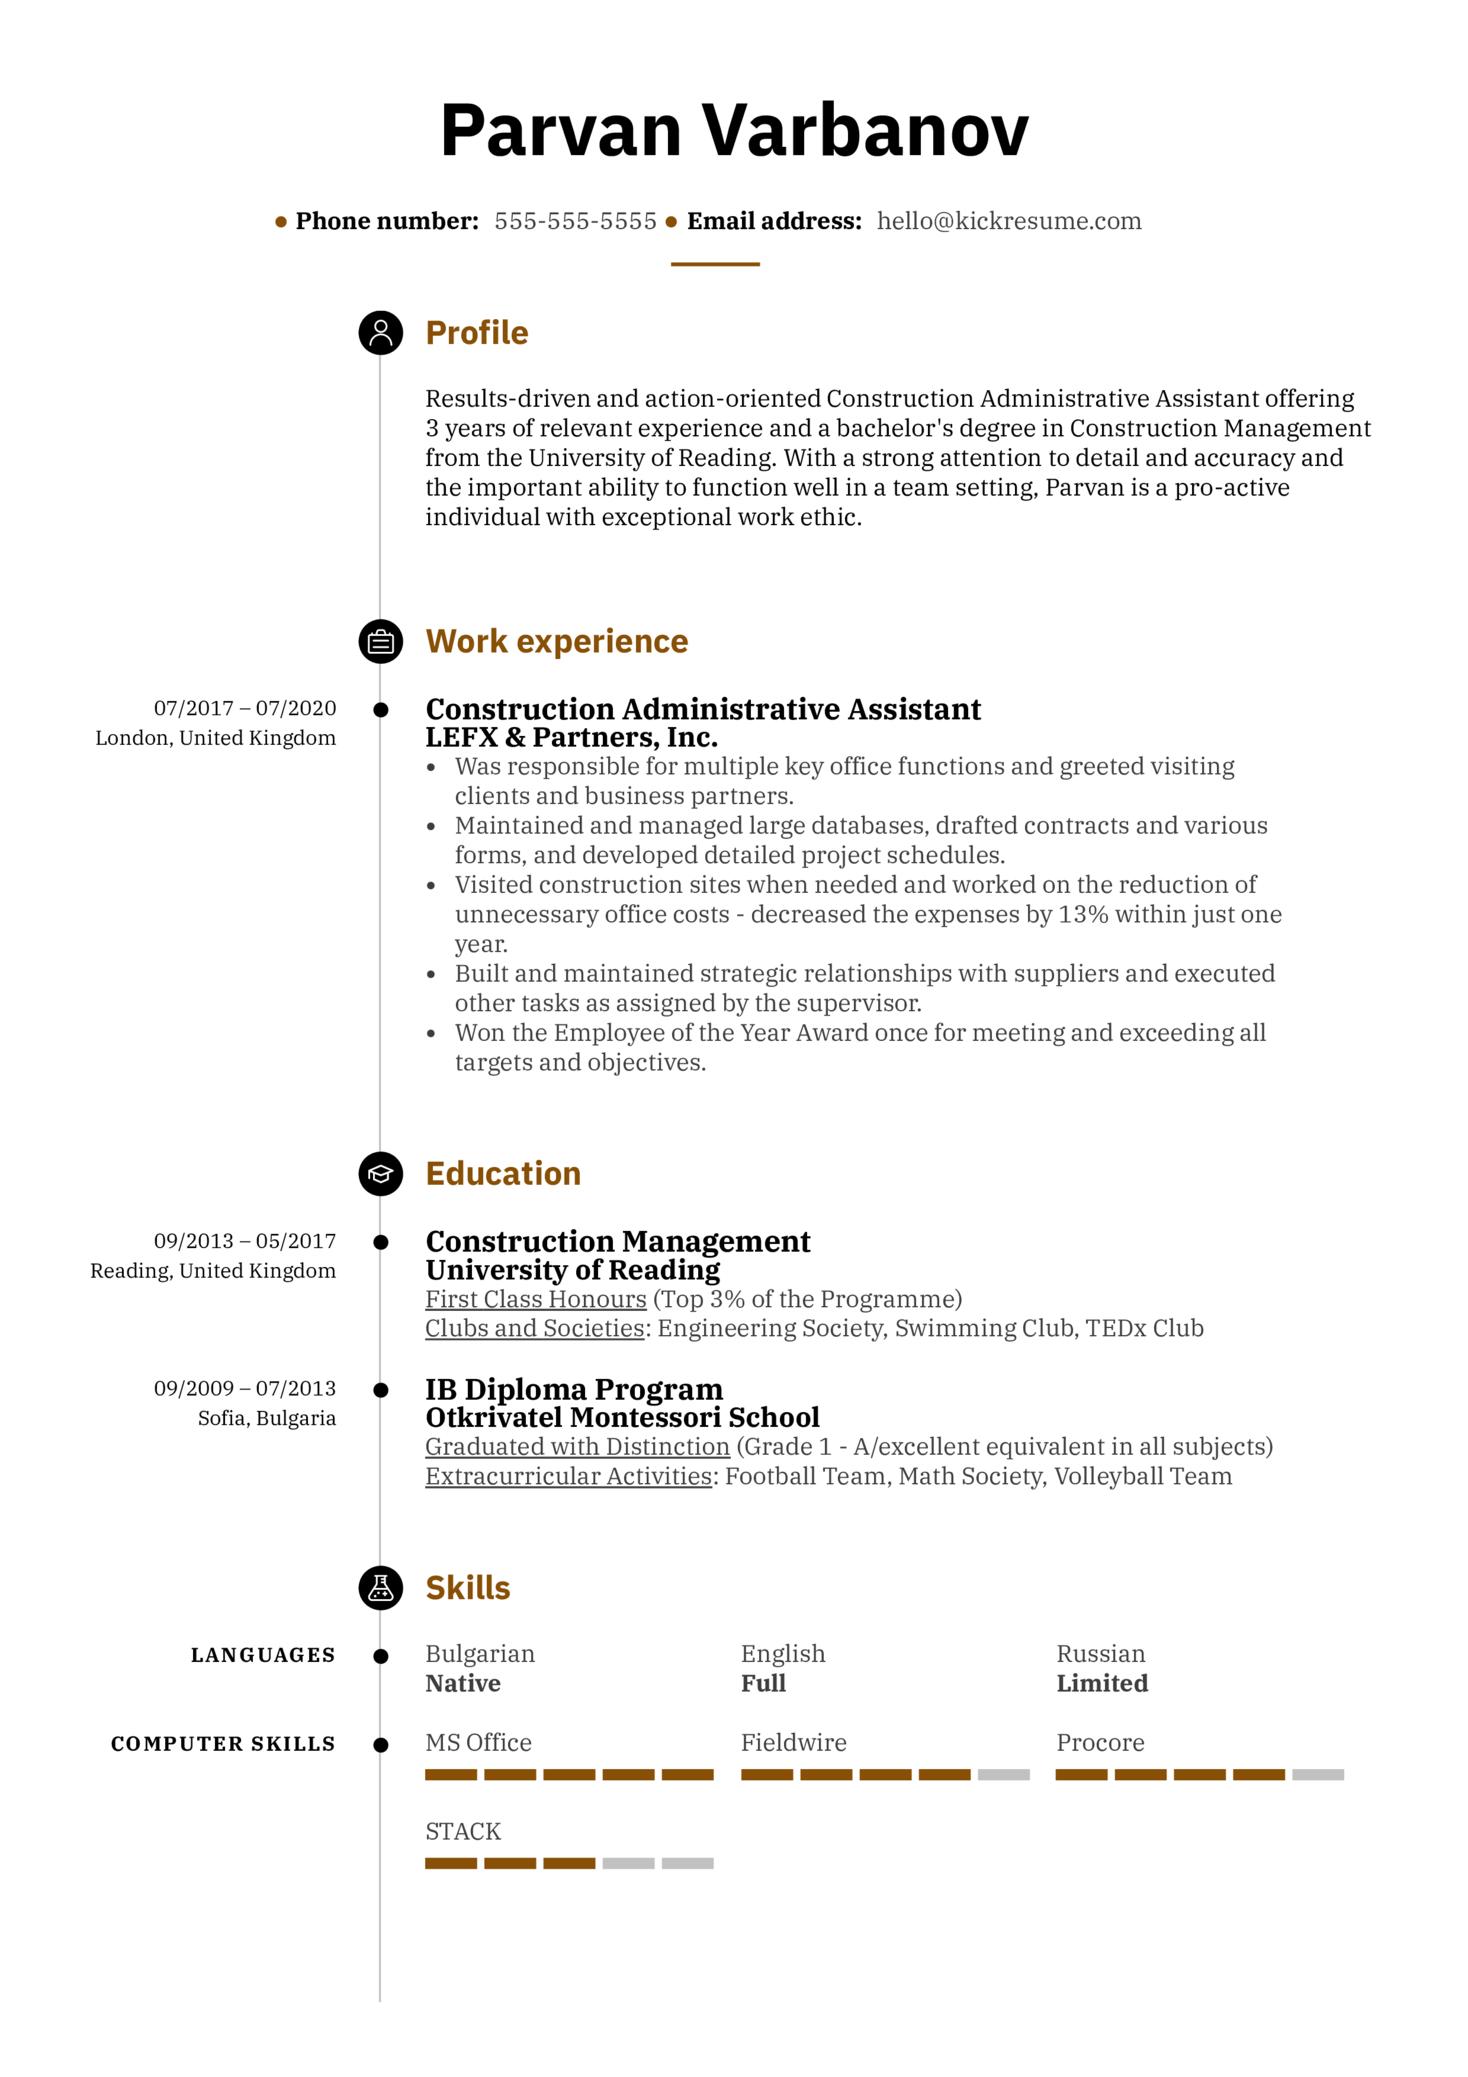 Construction Administrative Assistant Resume Sample (časť 1)